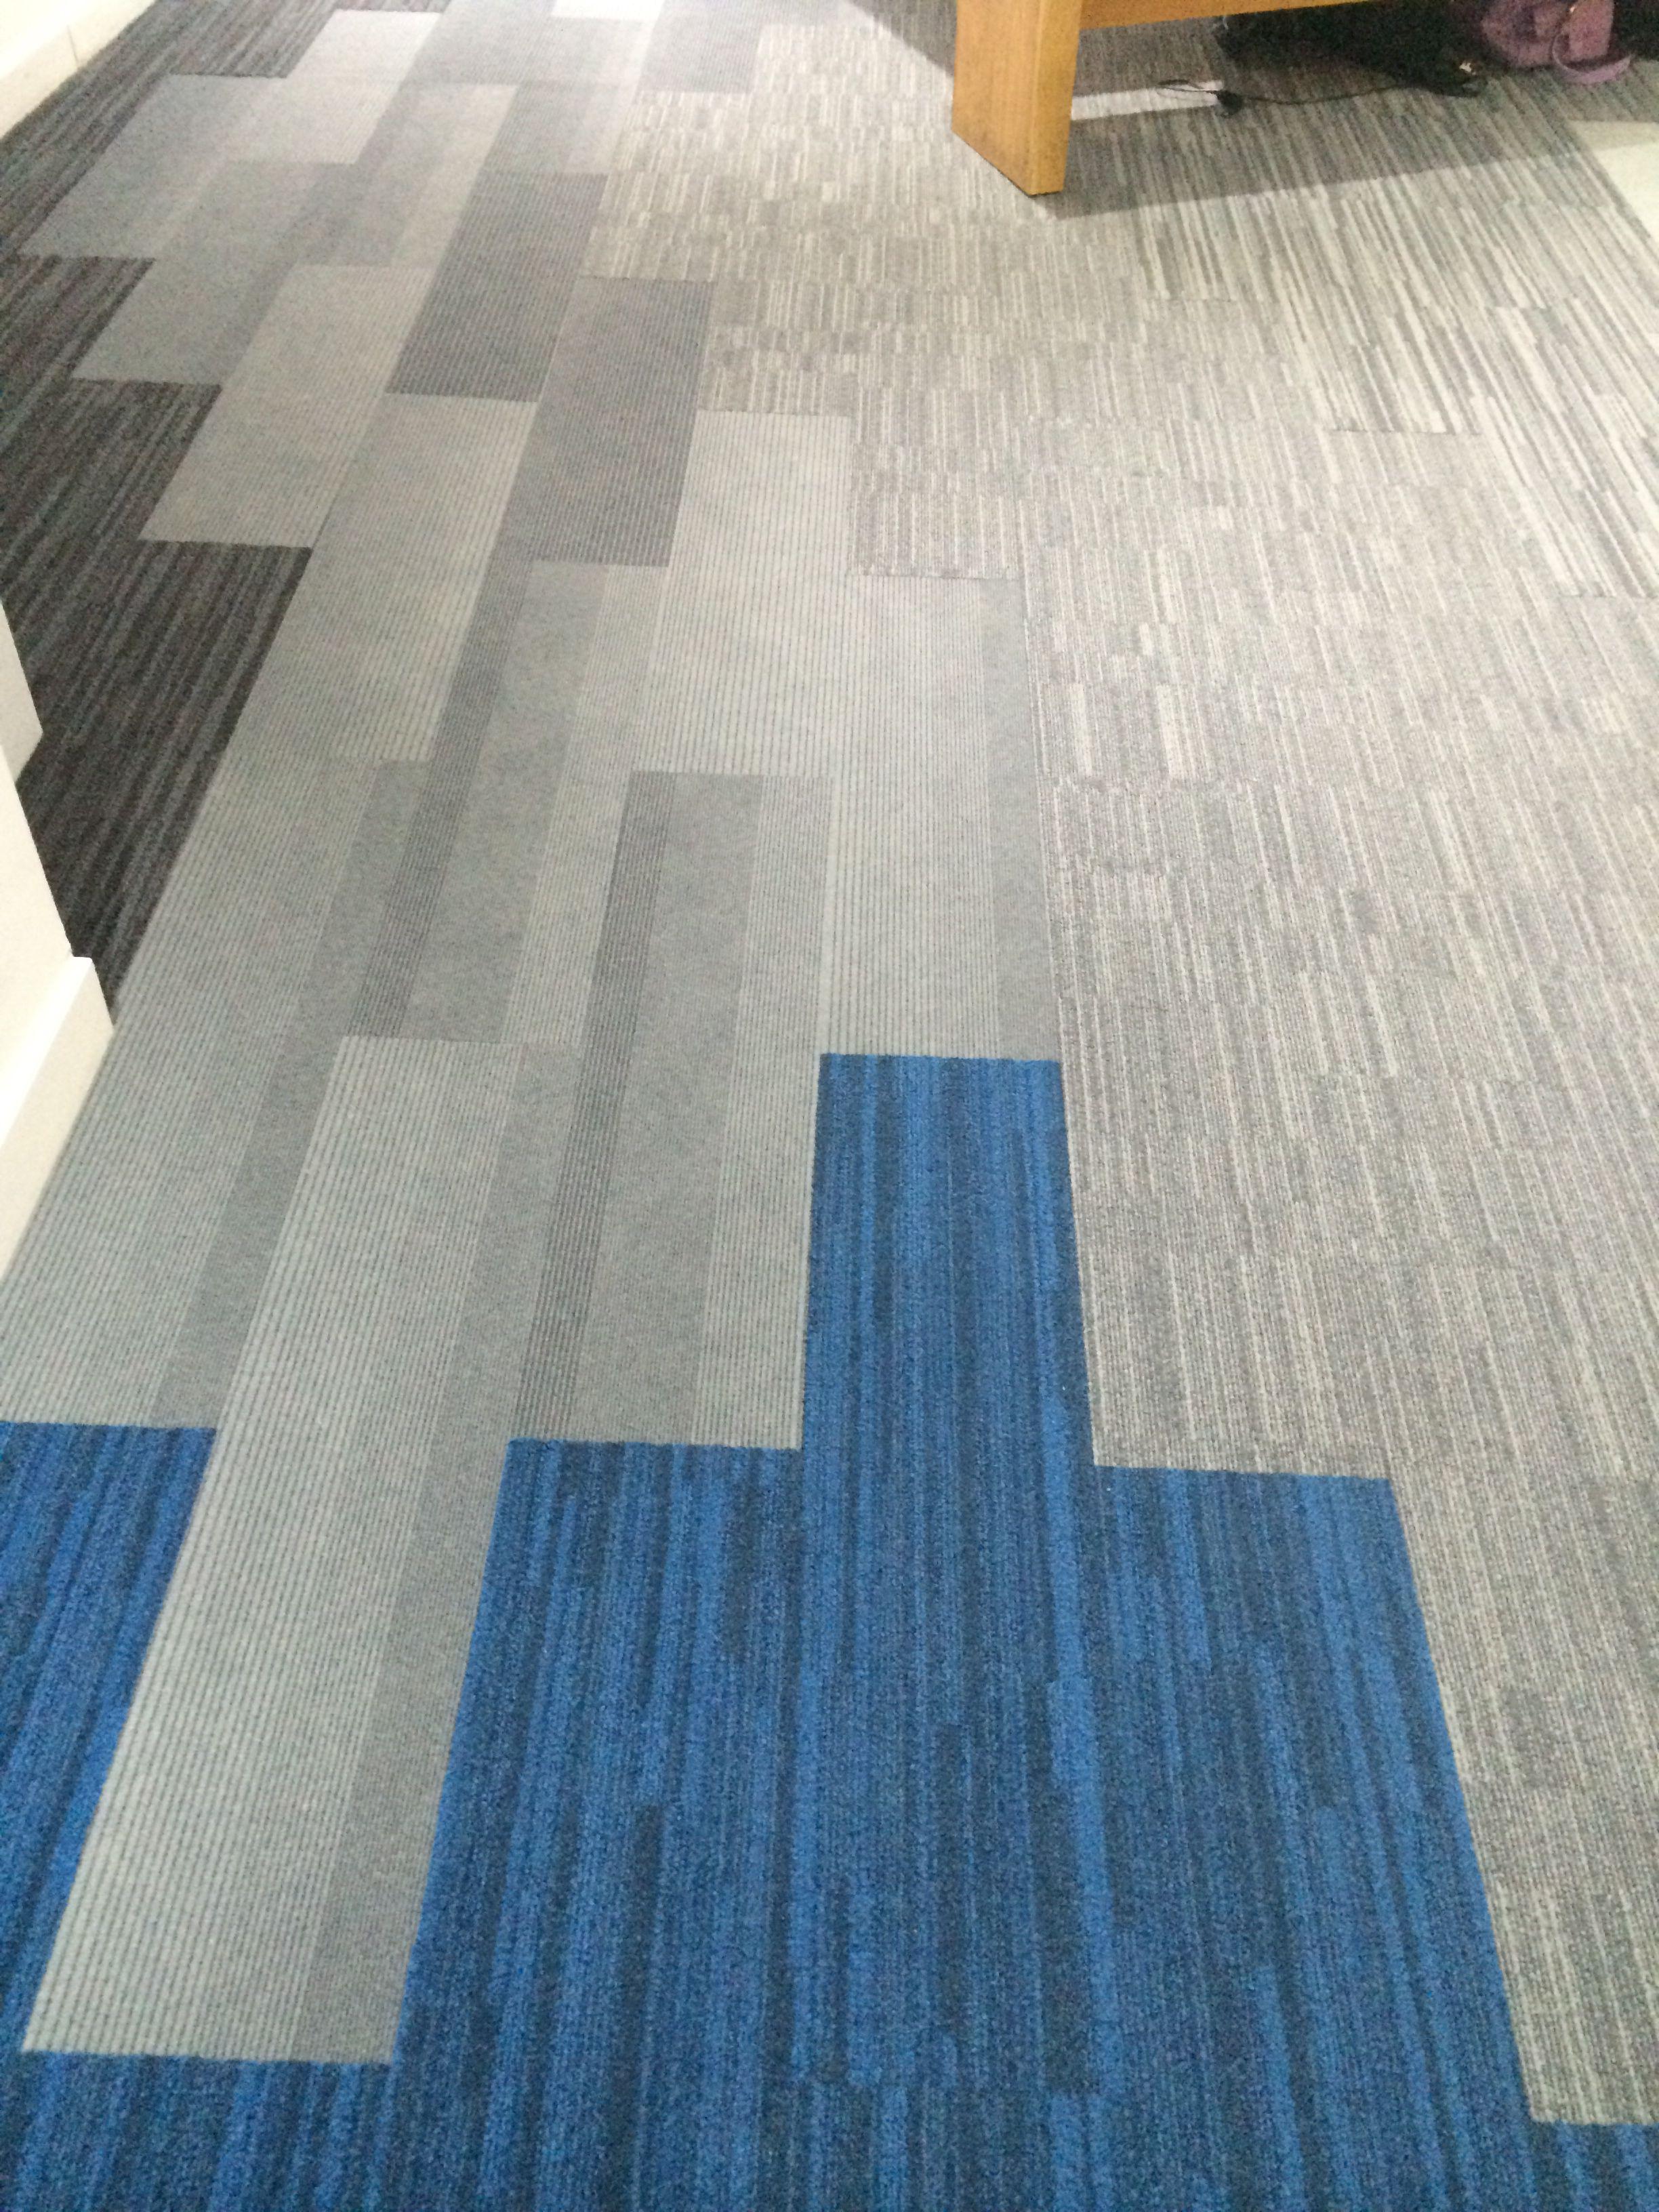 Carpet Tile Planks By Interface Flooring Office